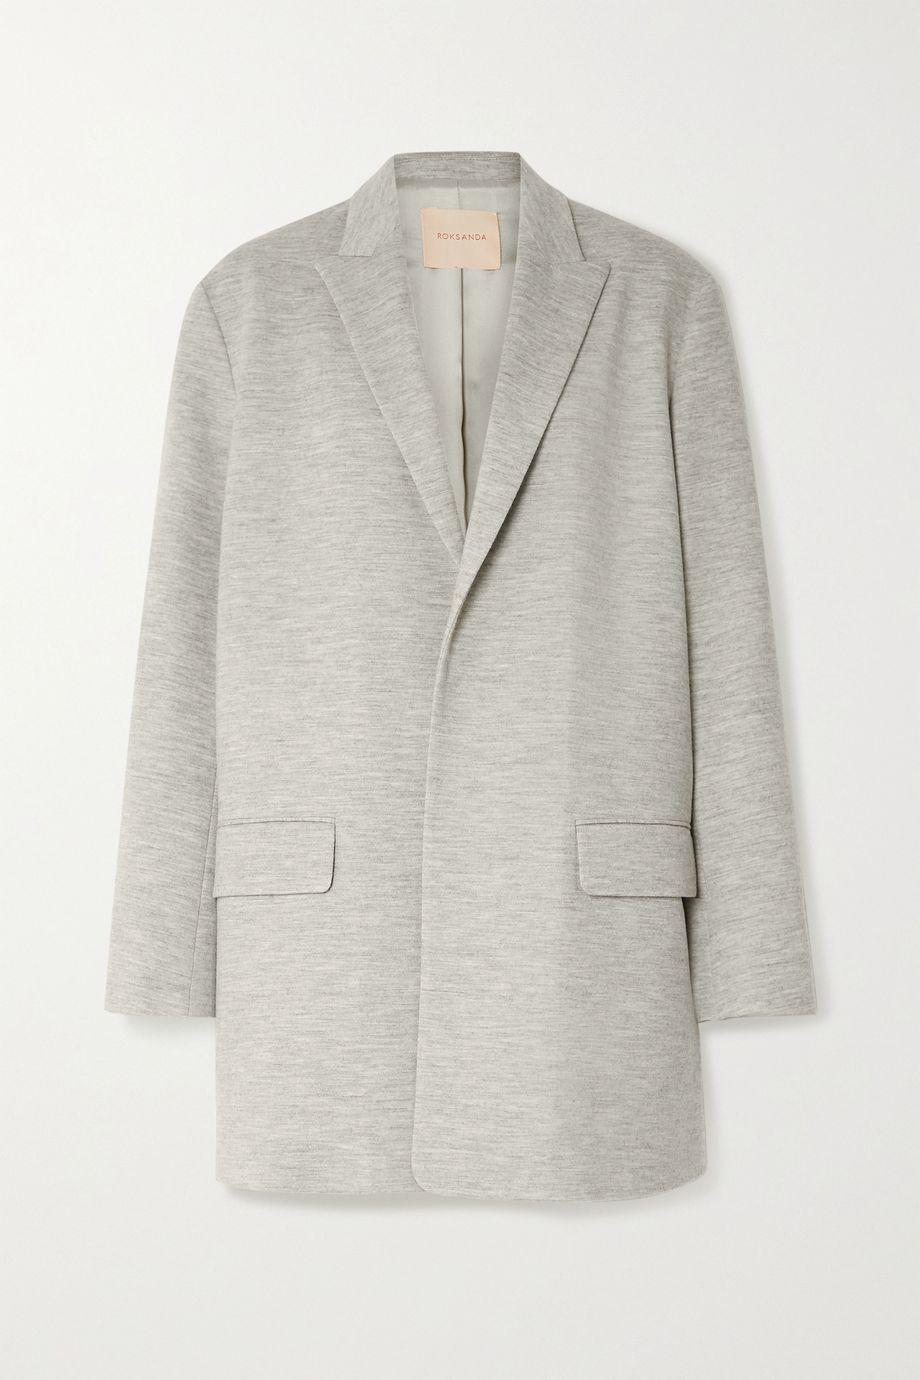 Roksanda Shida wool-jersey blazer